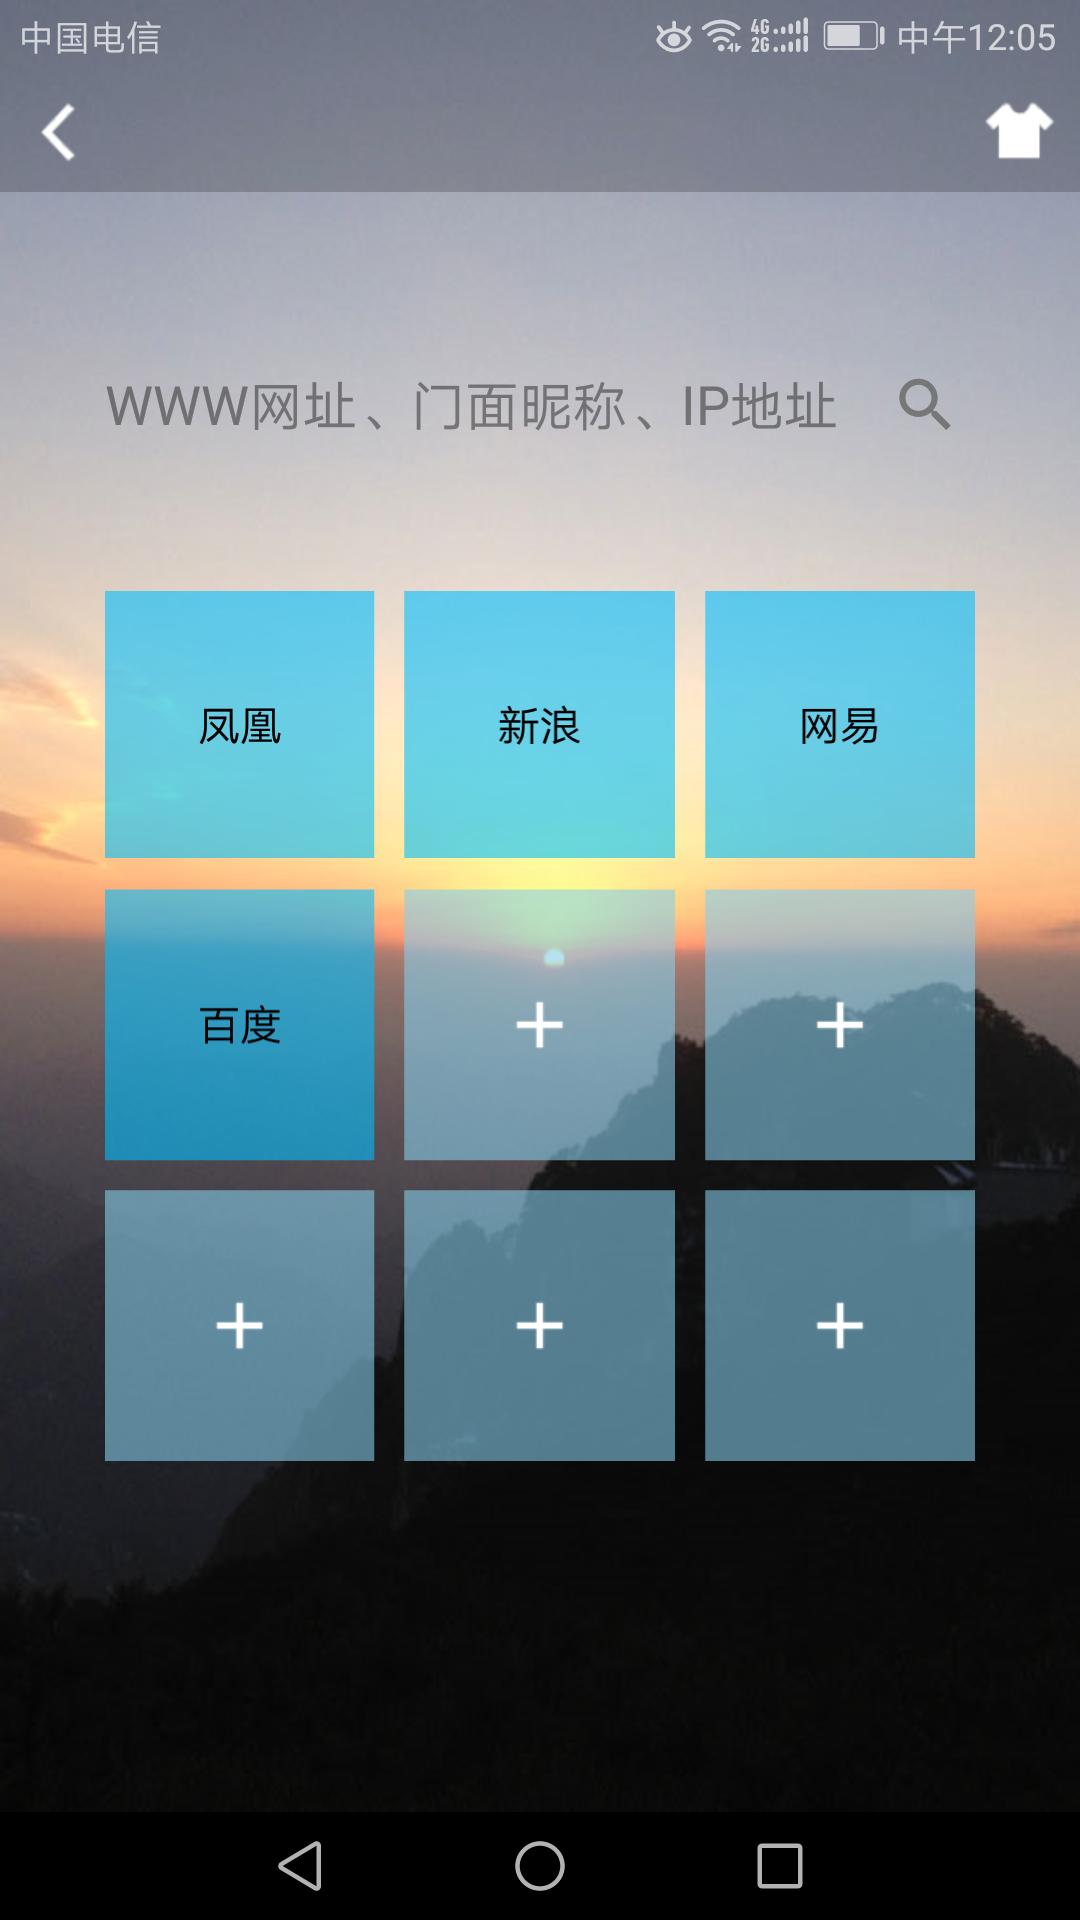 GateFace门面免费考试系统安卓手机版